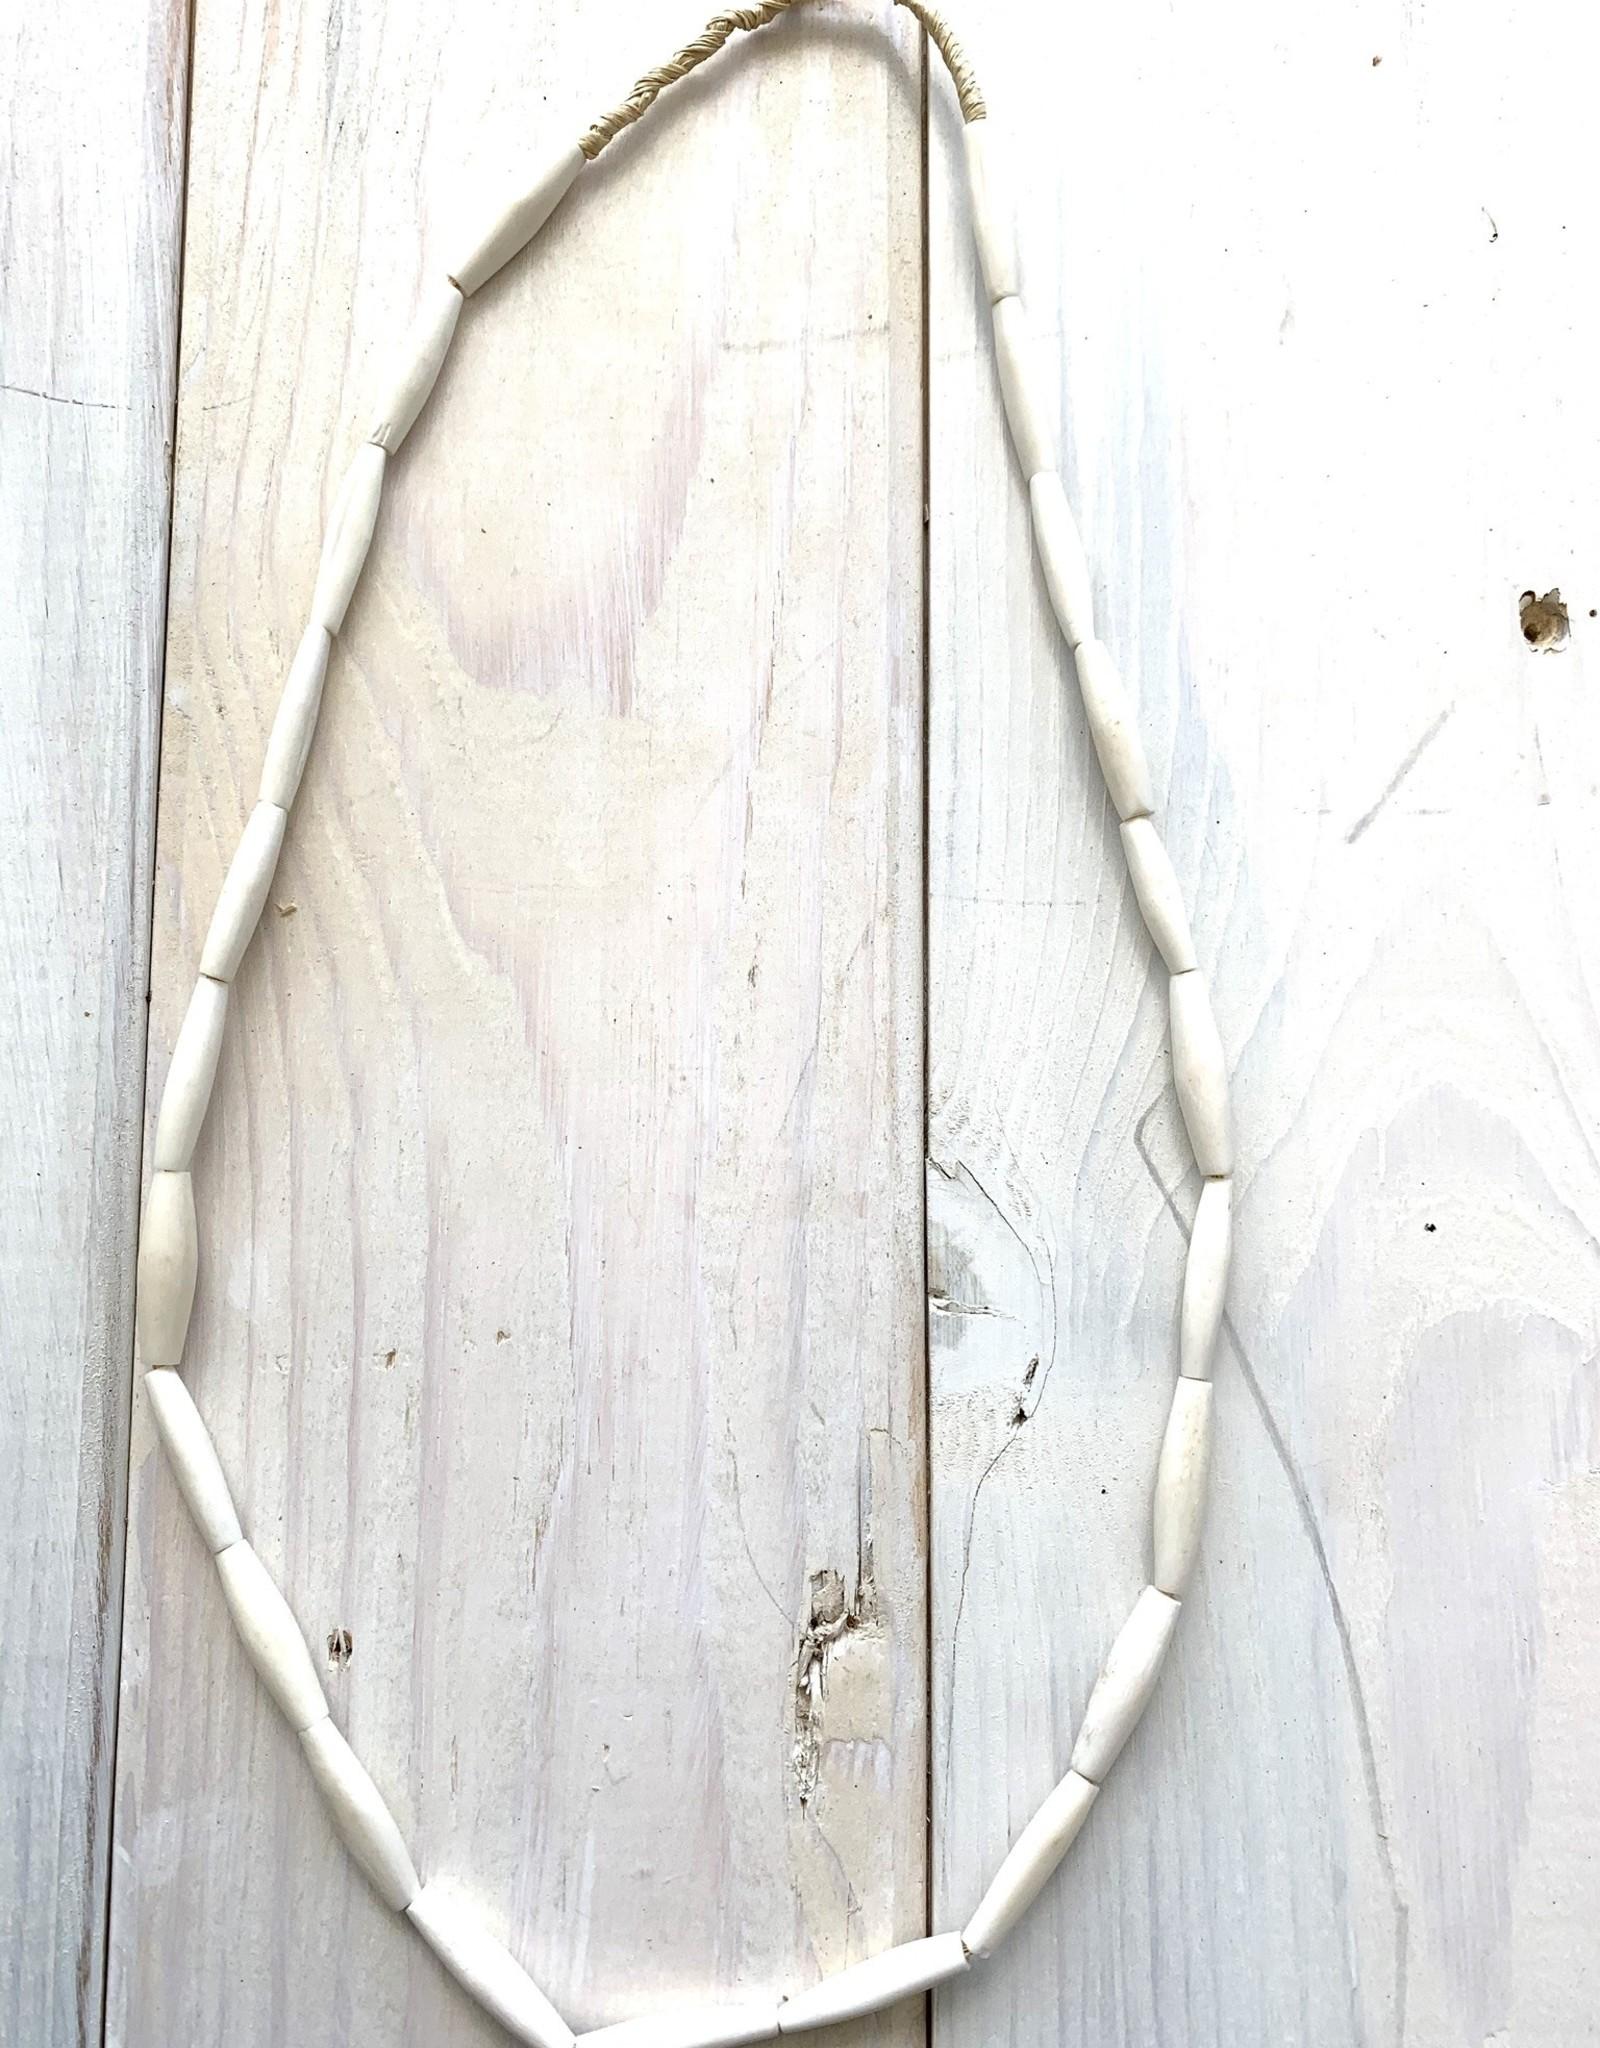 Kenya White Pipe Bone Strands